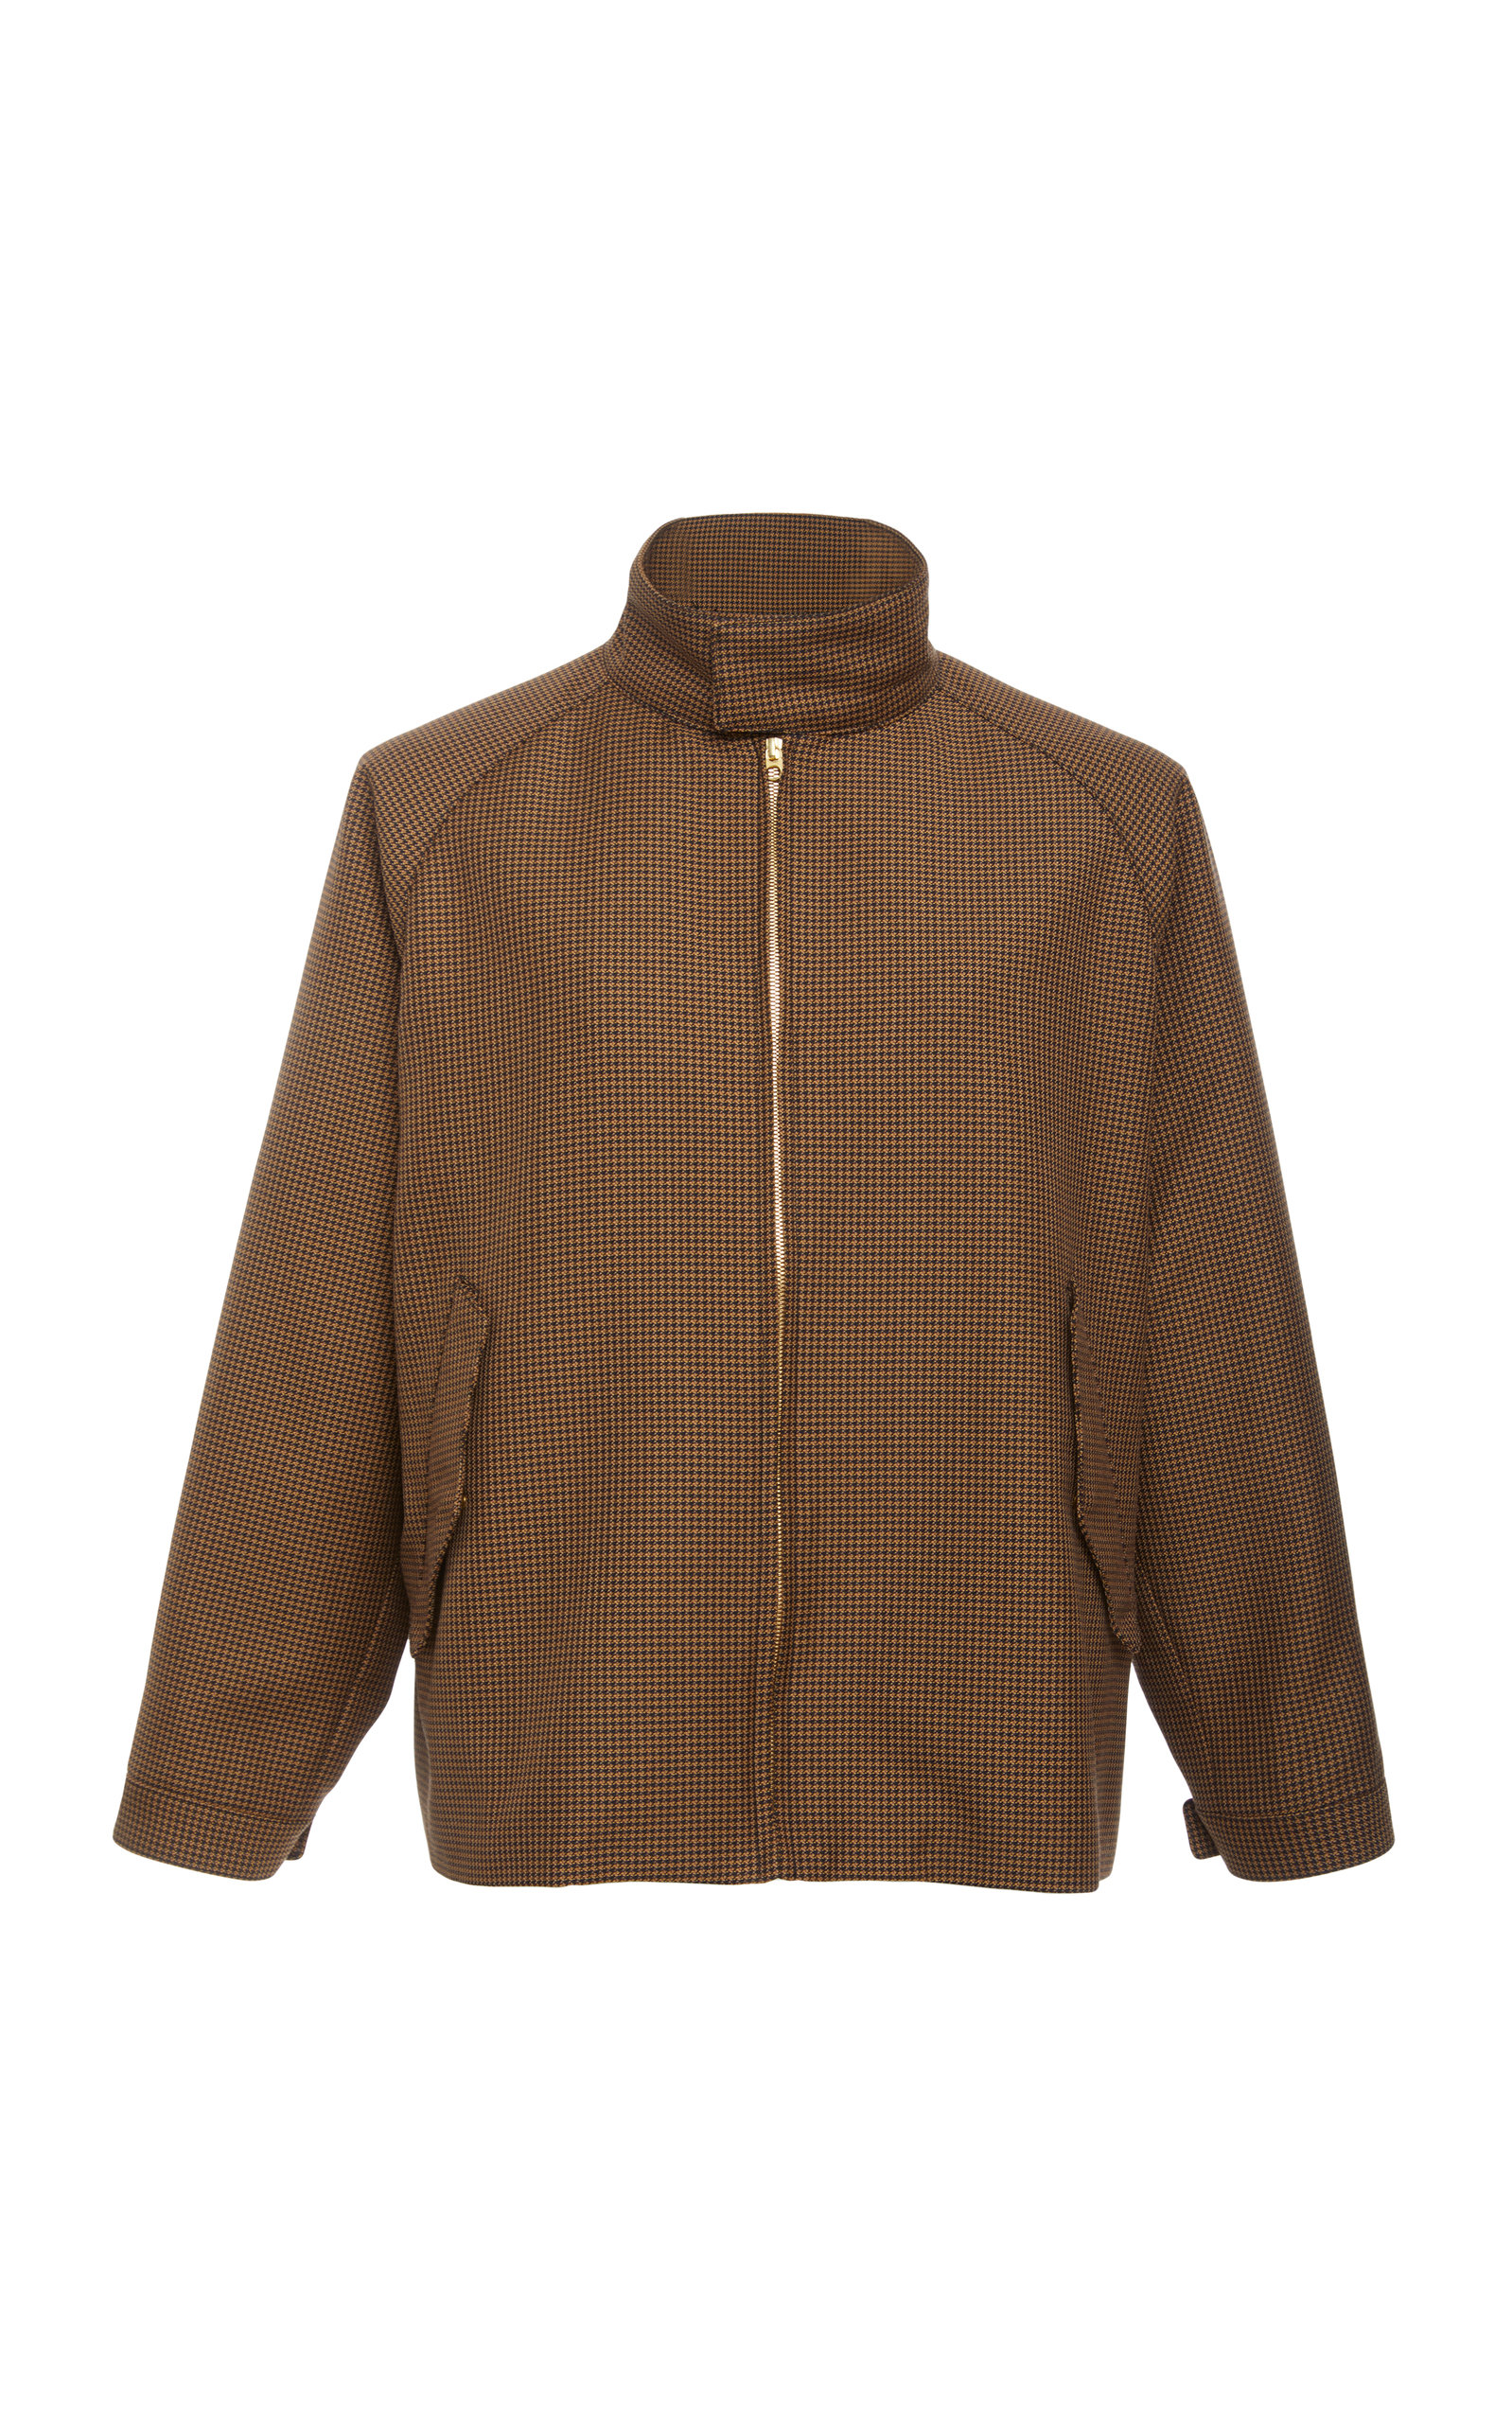 CAMOSHITA No-Collar Zip Jacket in Multi